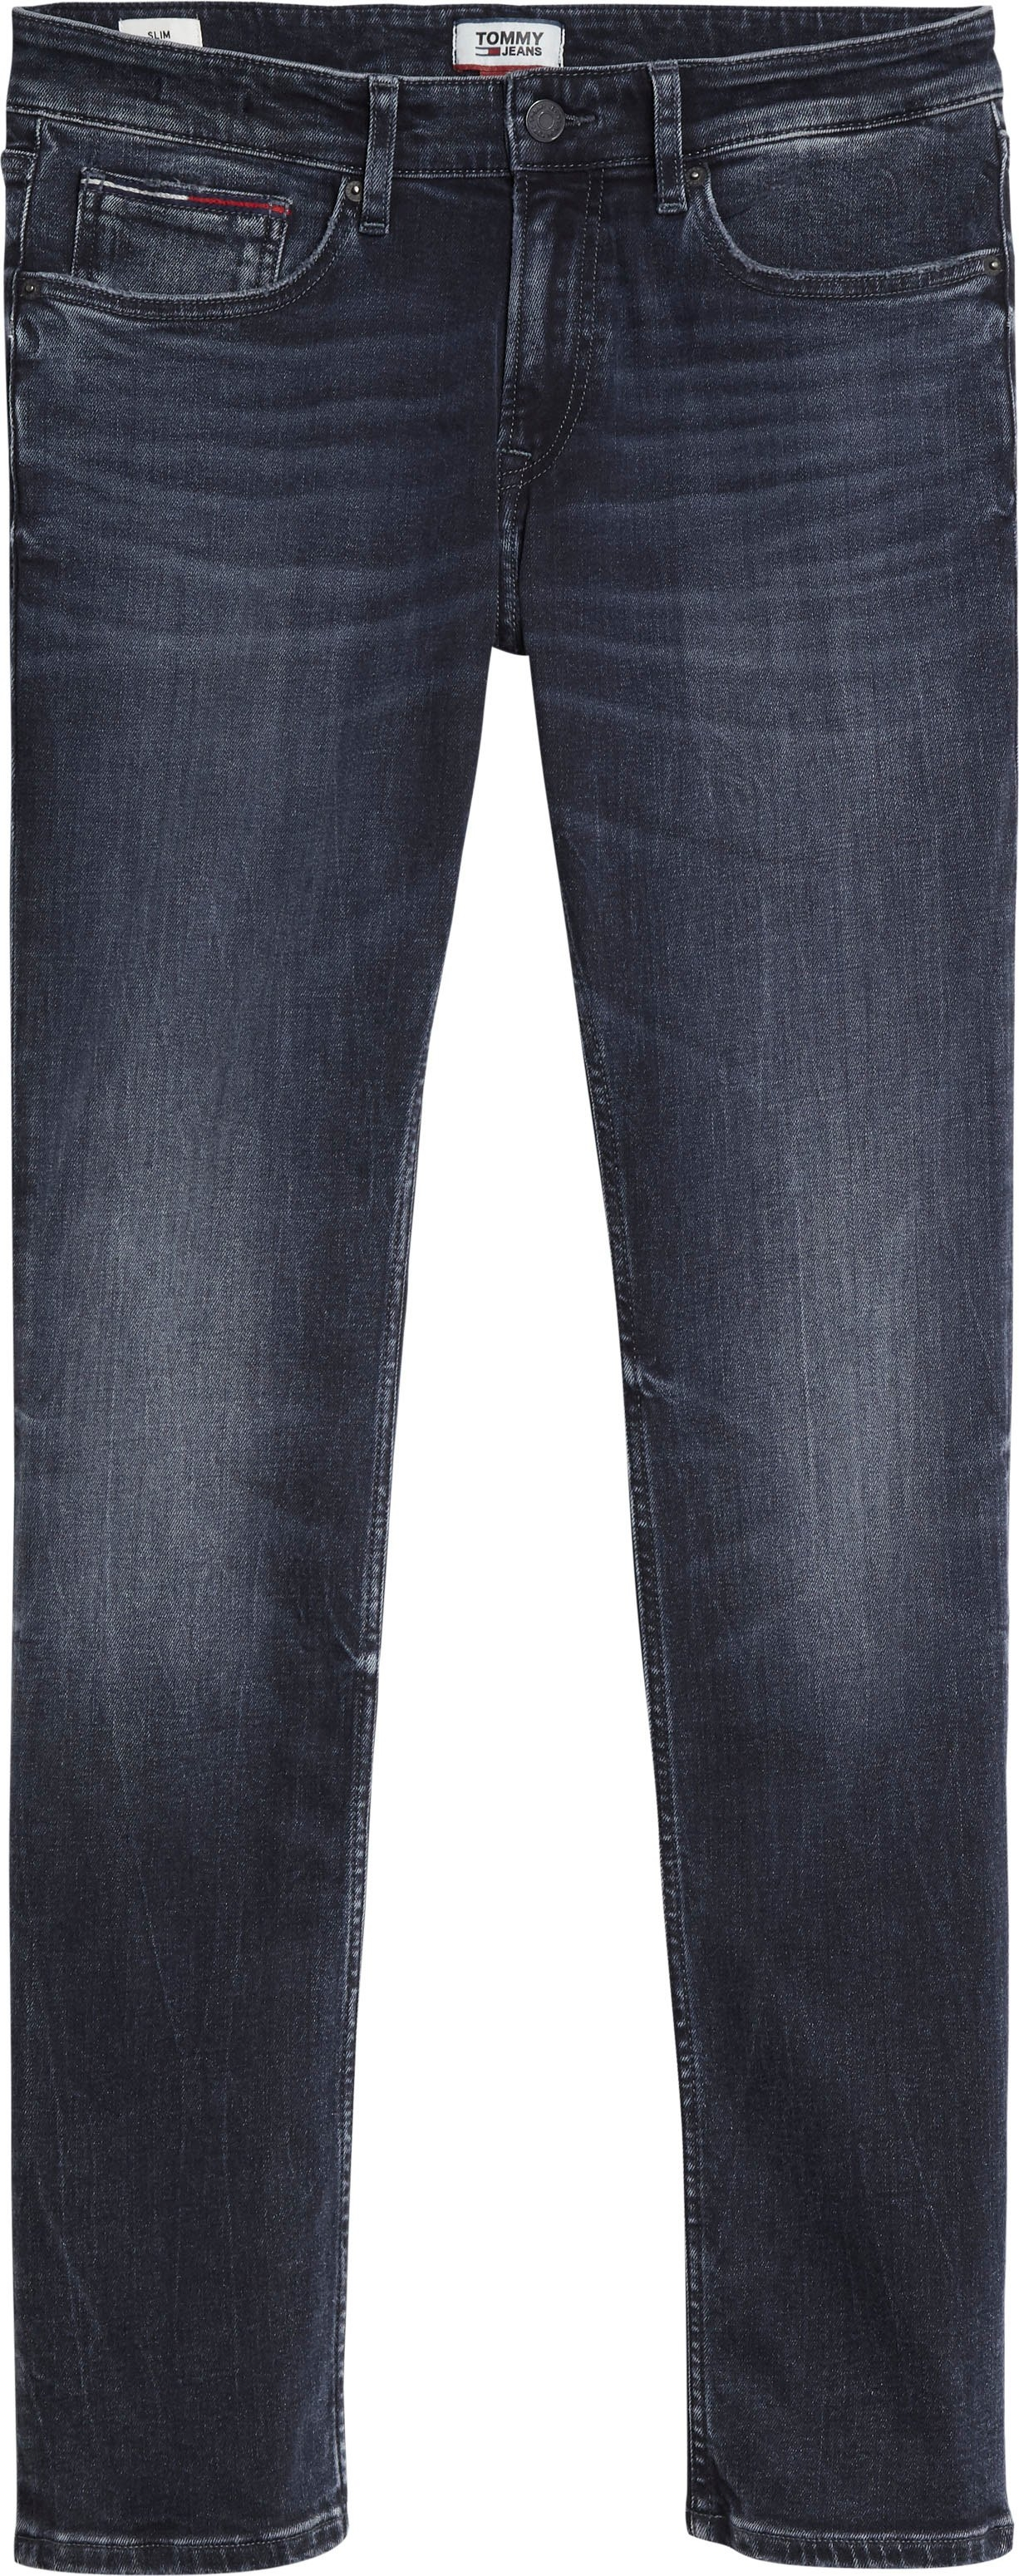 TOMMY JEANS slim fit jeans »SCANTON SLIM« bestellen: 30 dagen bedenktijd